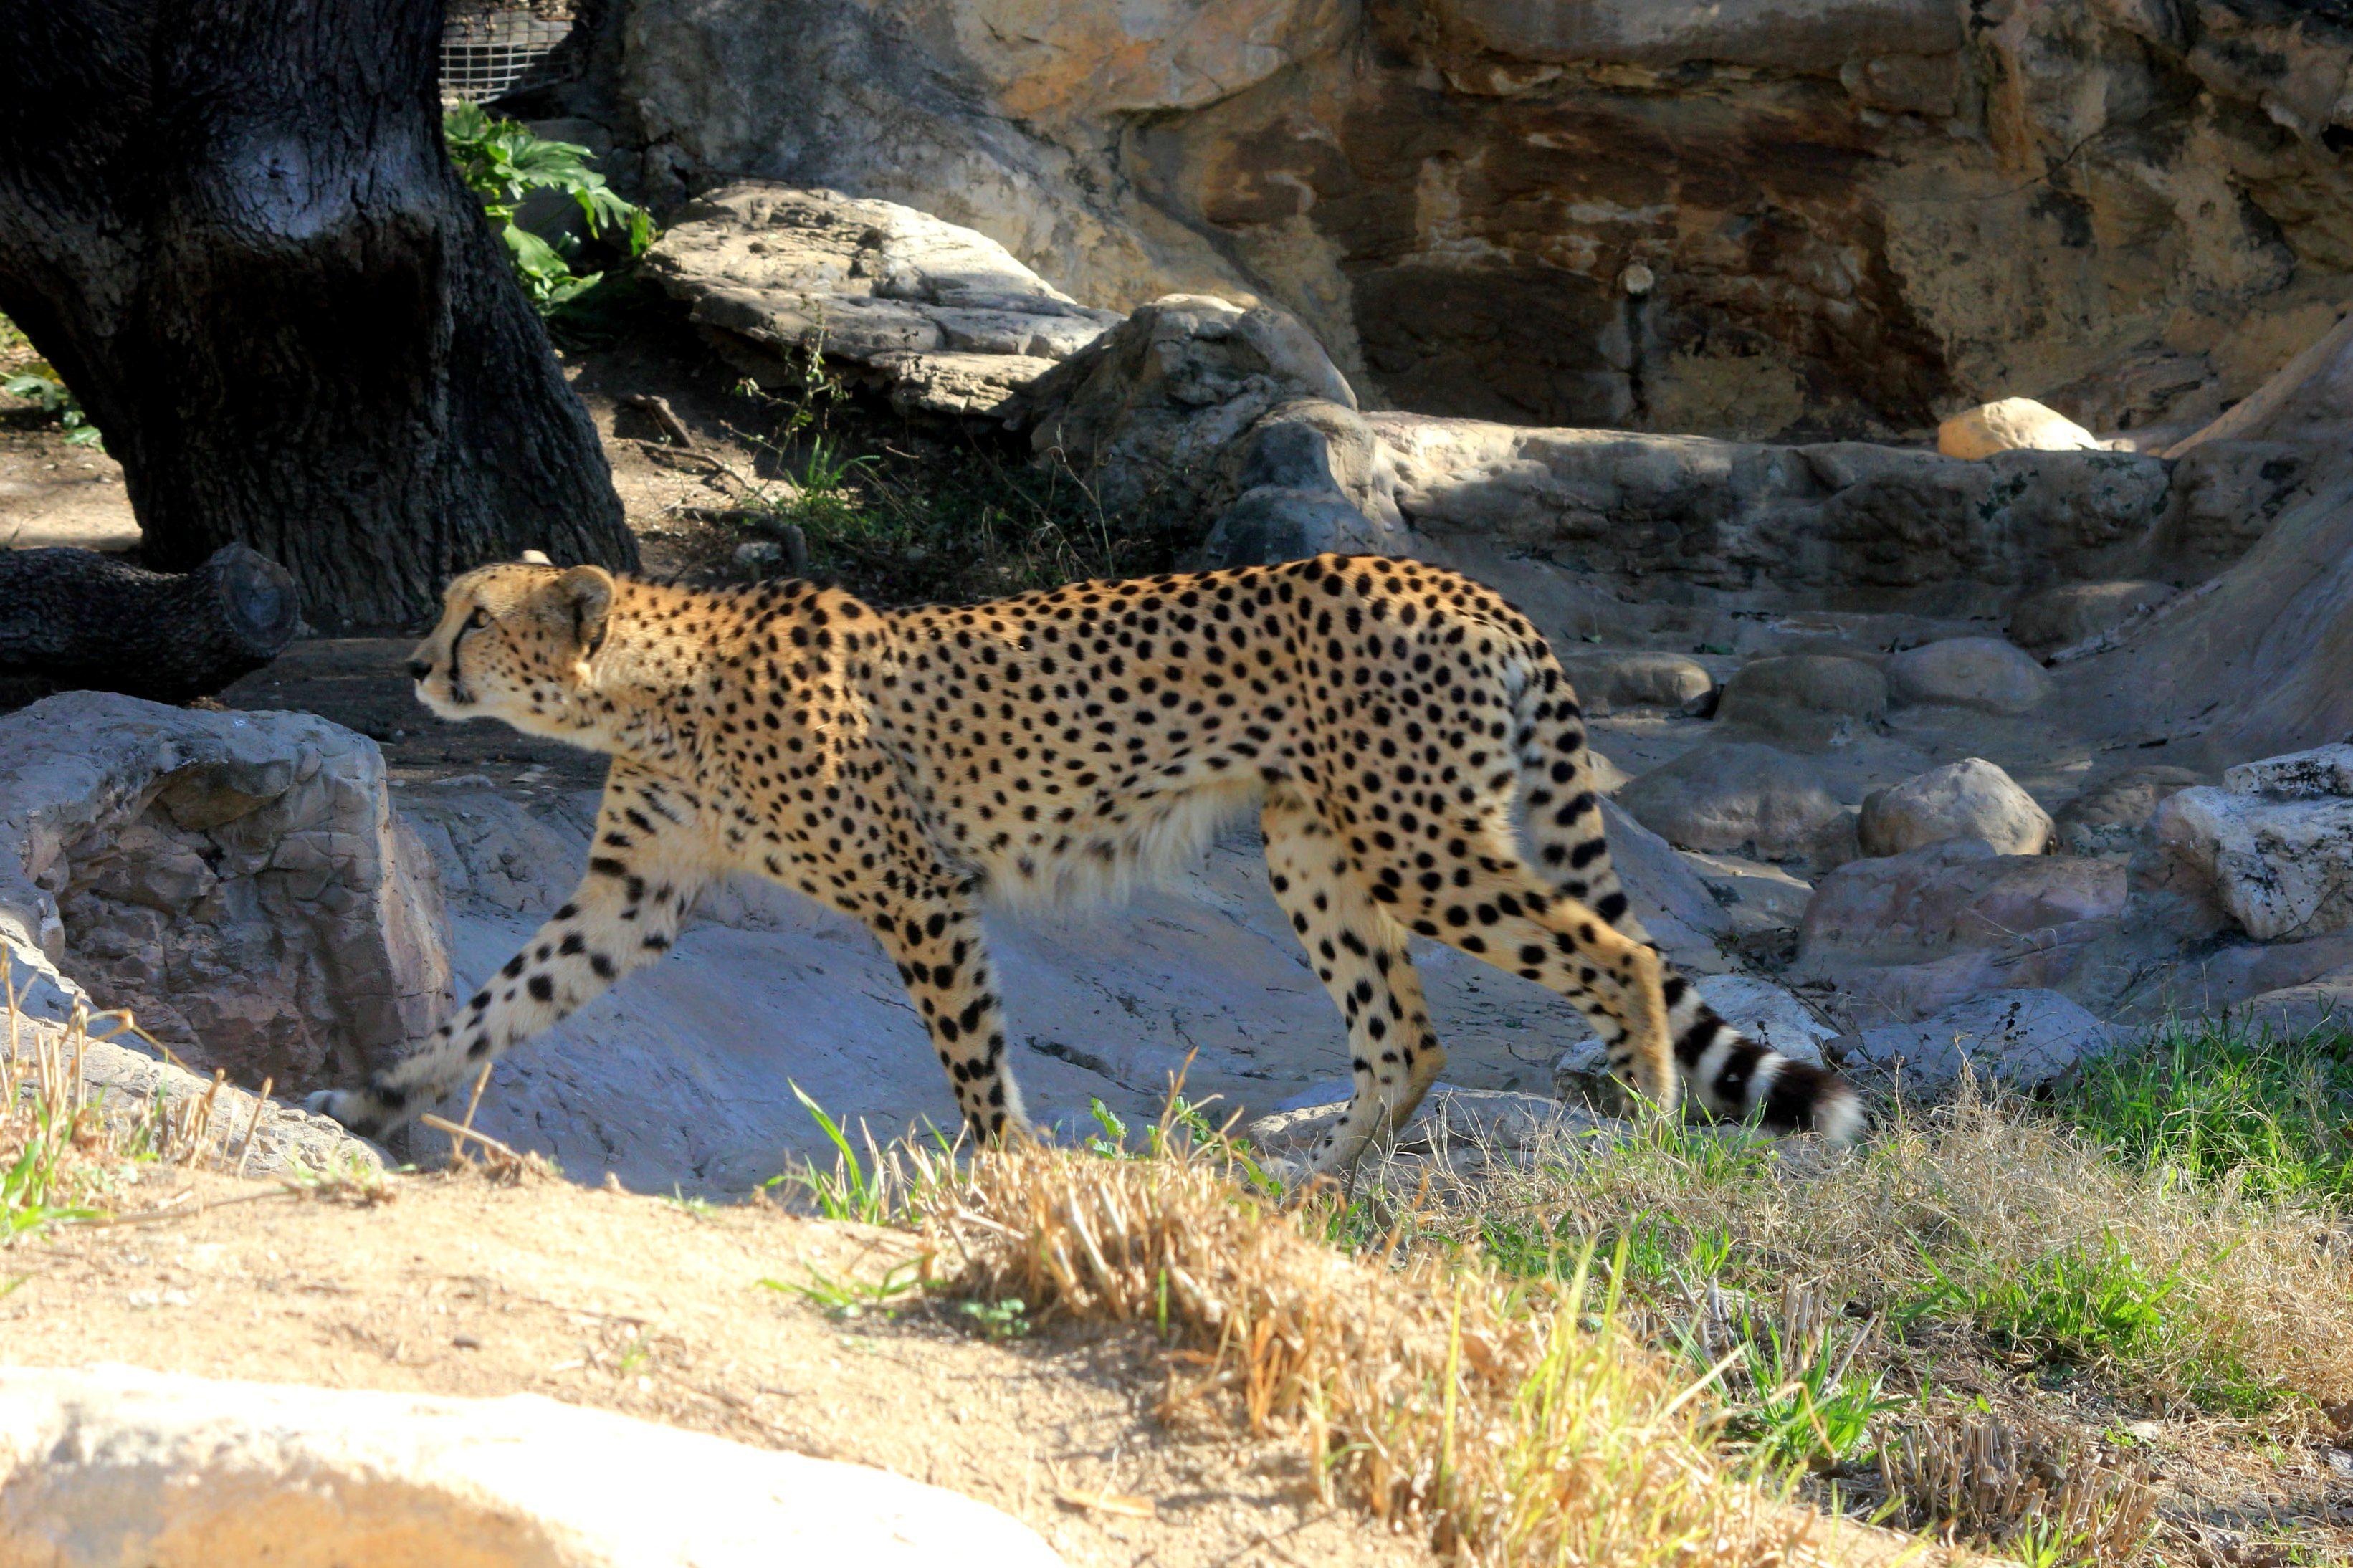 kostenlose bild gepard tier afrika